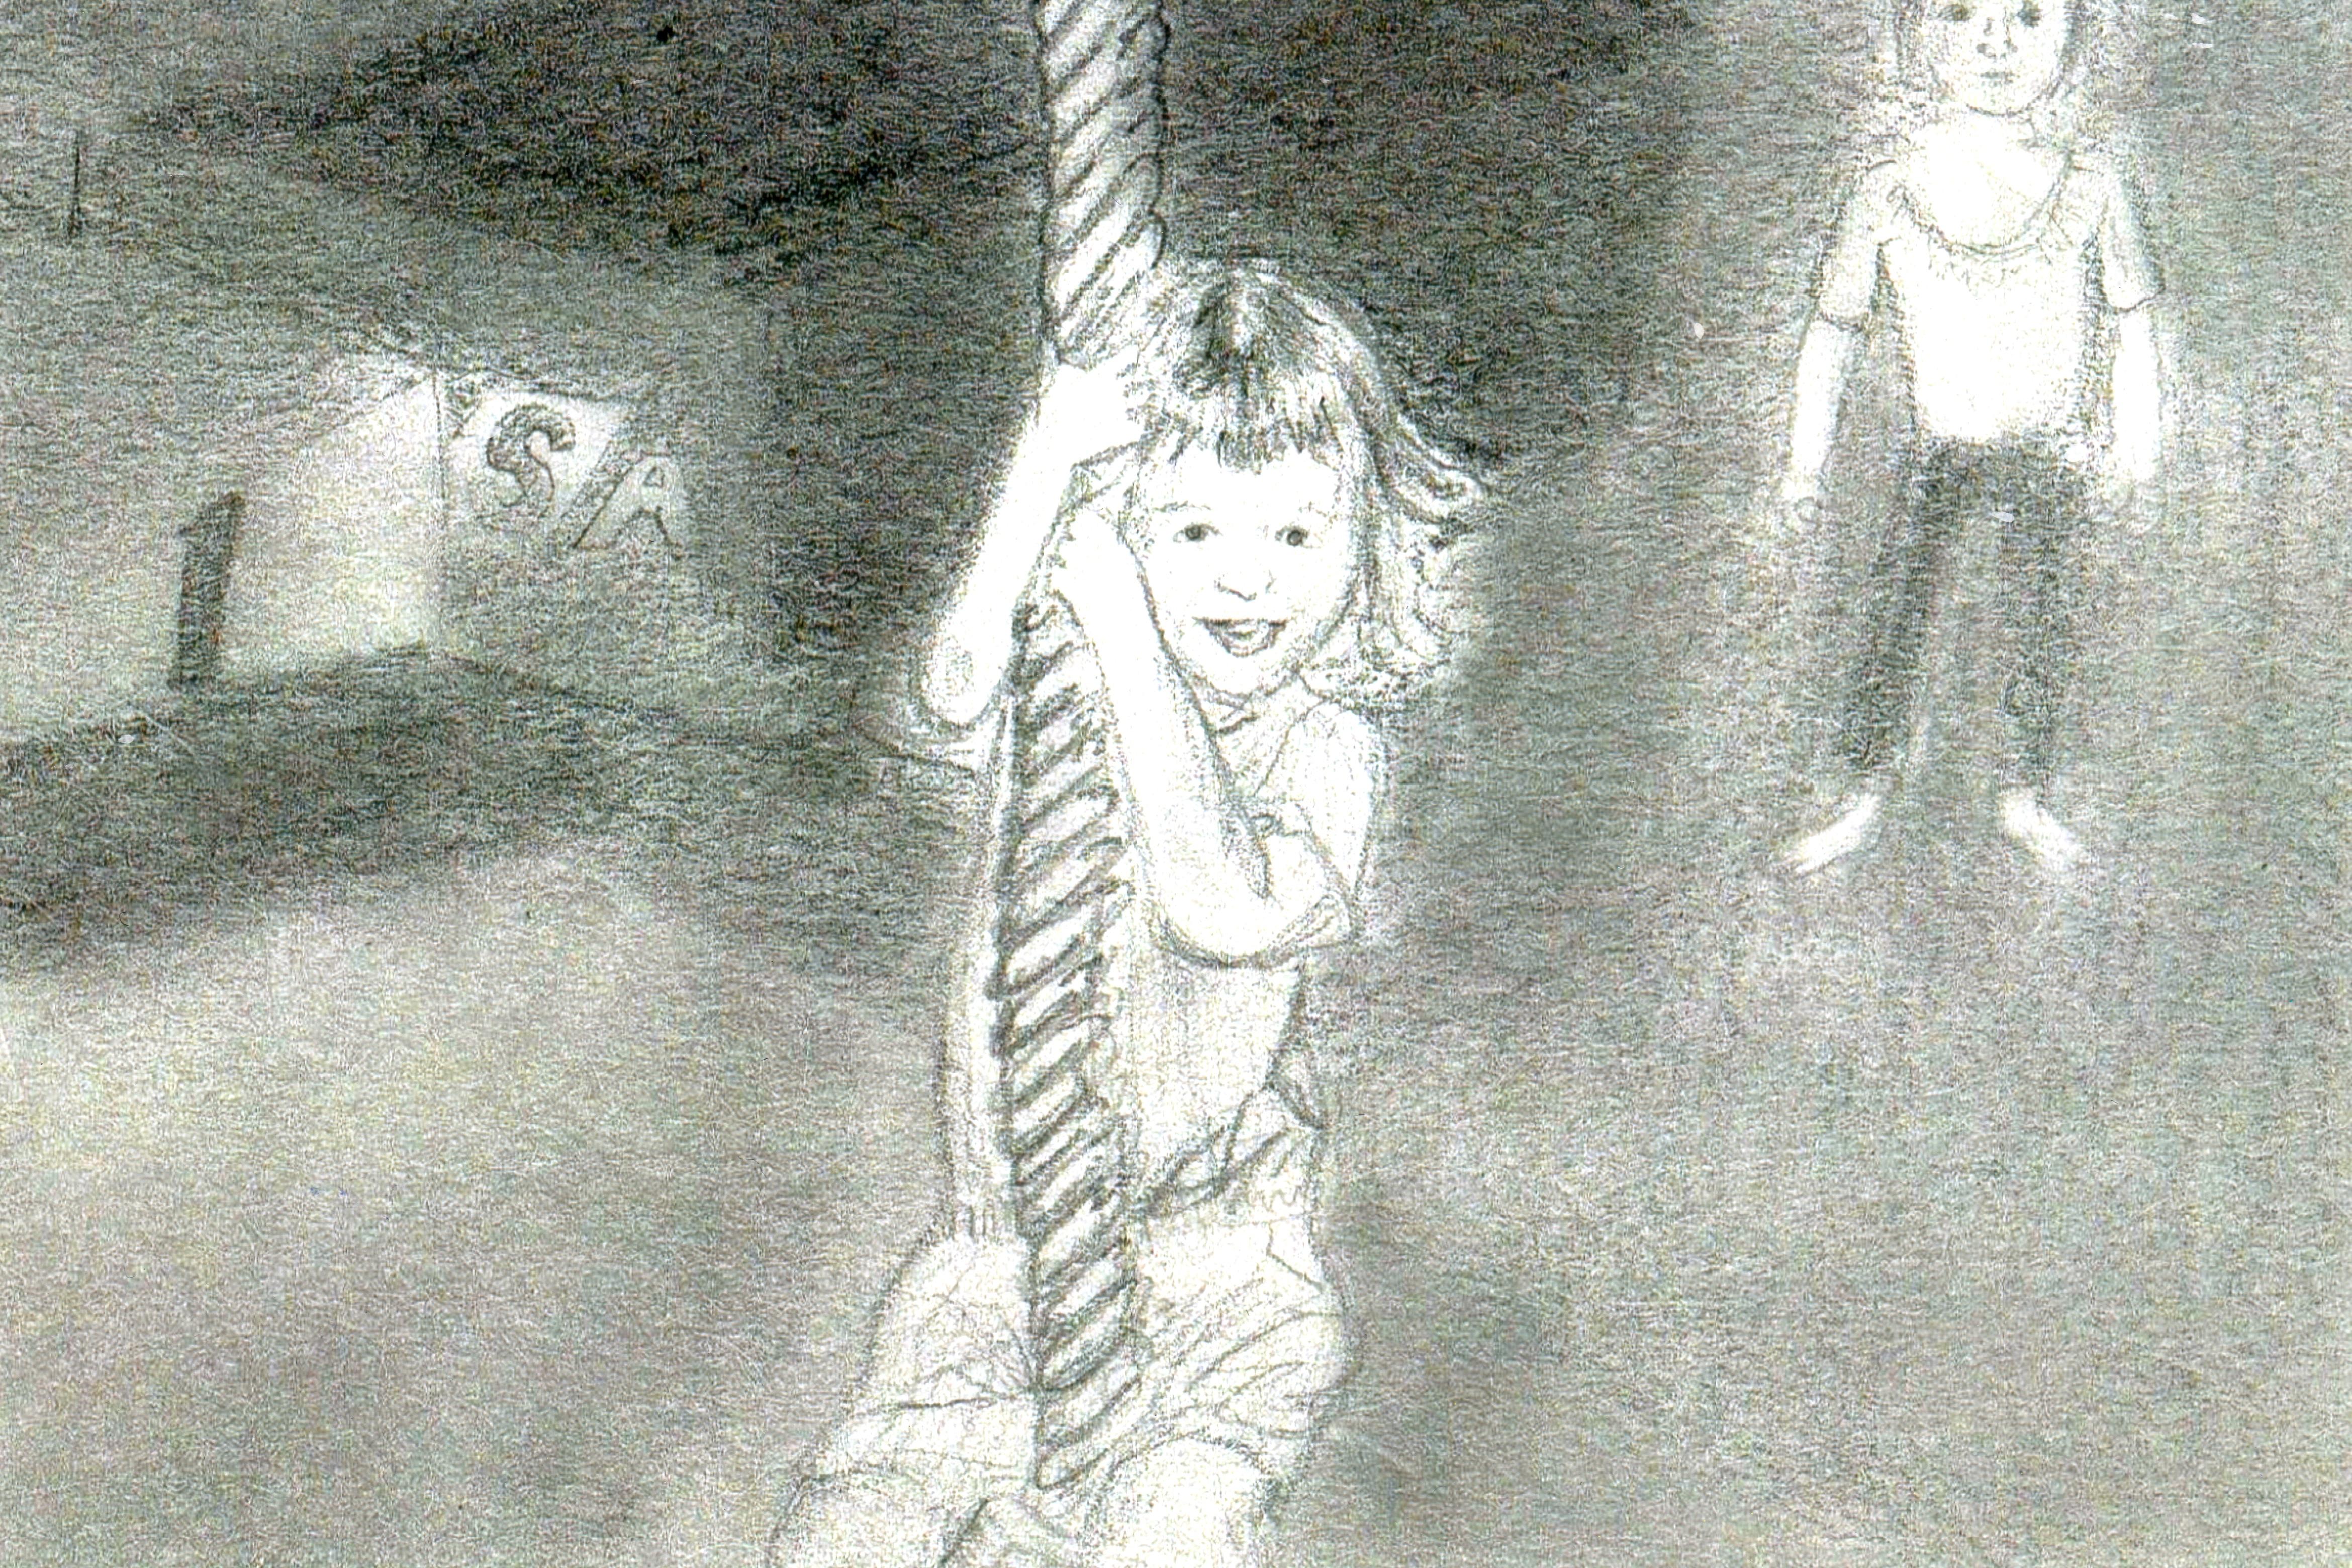 Rope swim at gymnastics